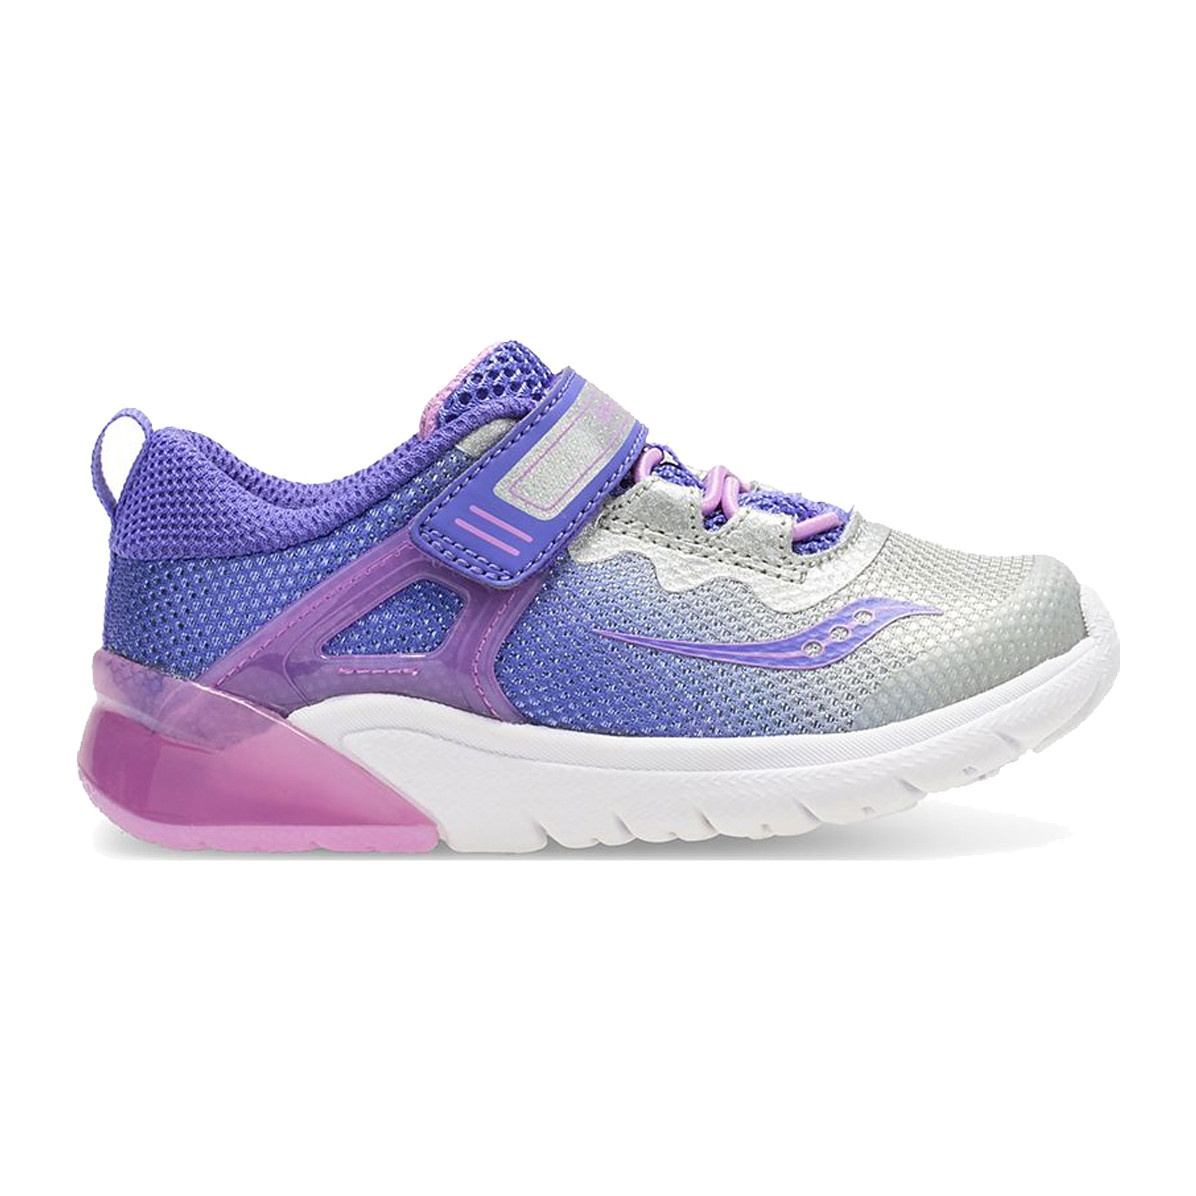 Saucony Saucony Baby Flash Glow Purple/Silver